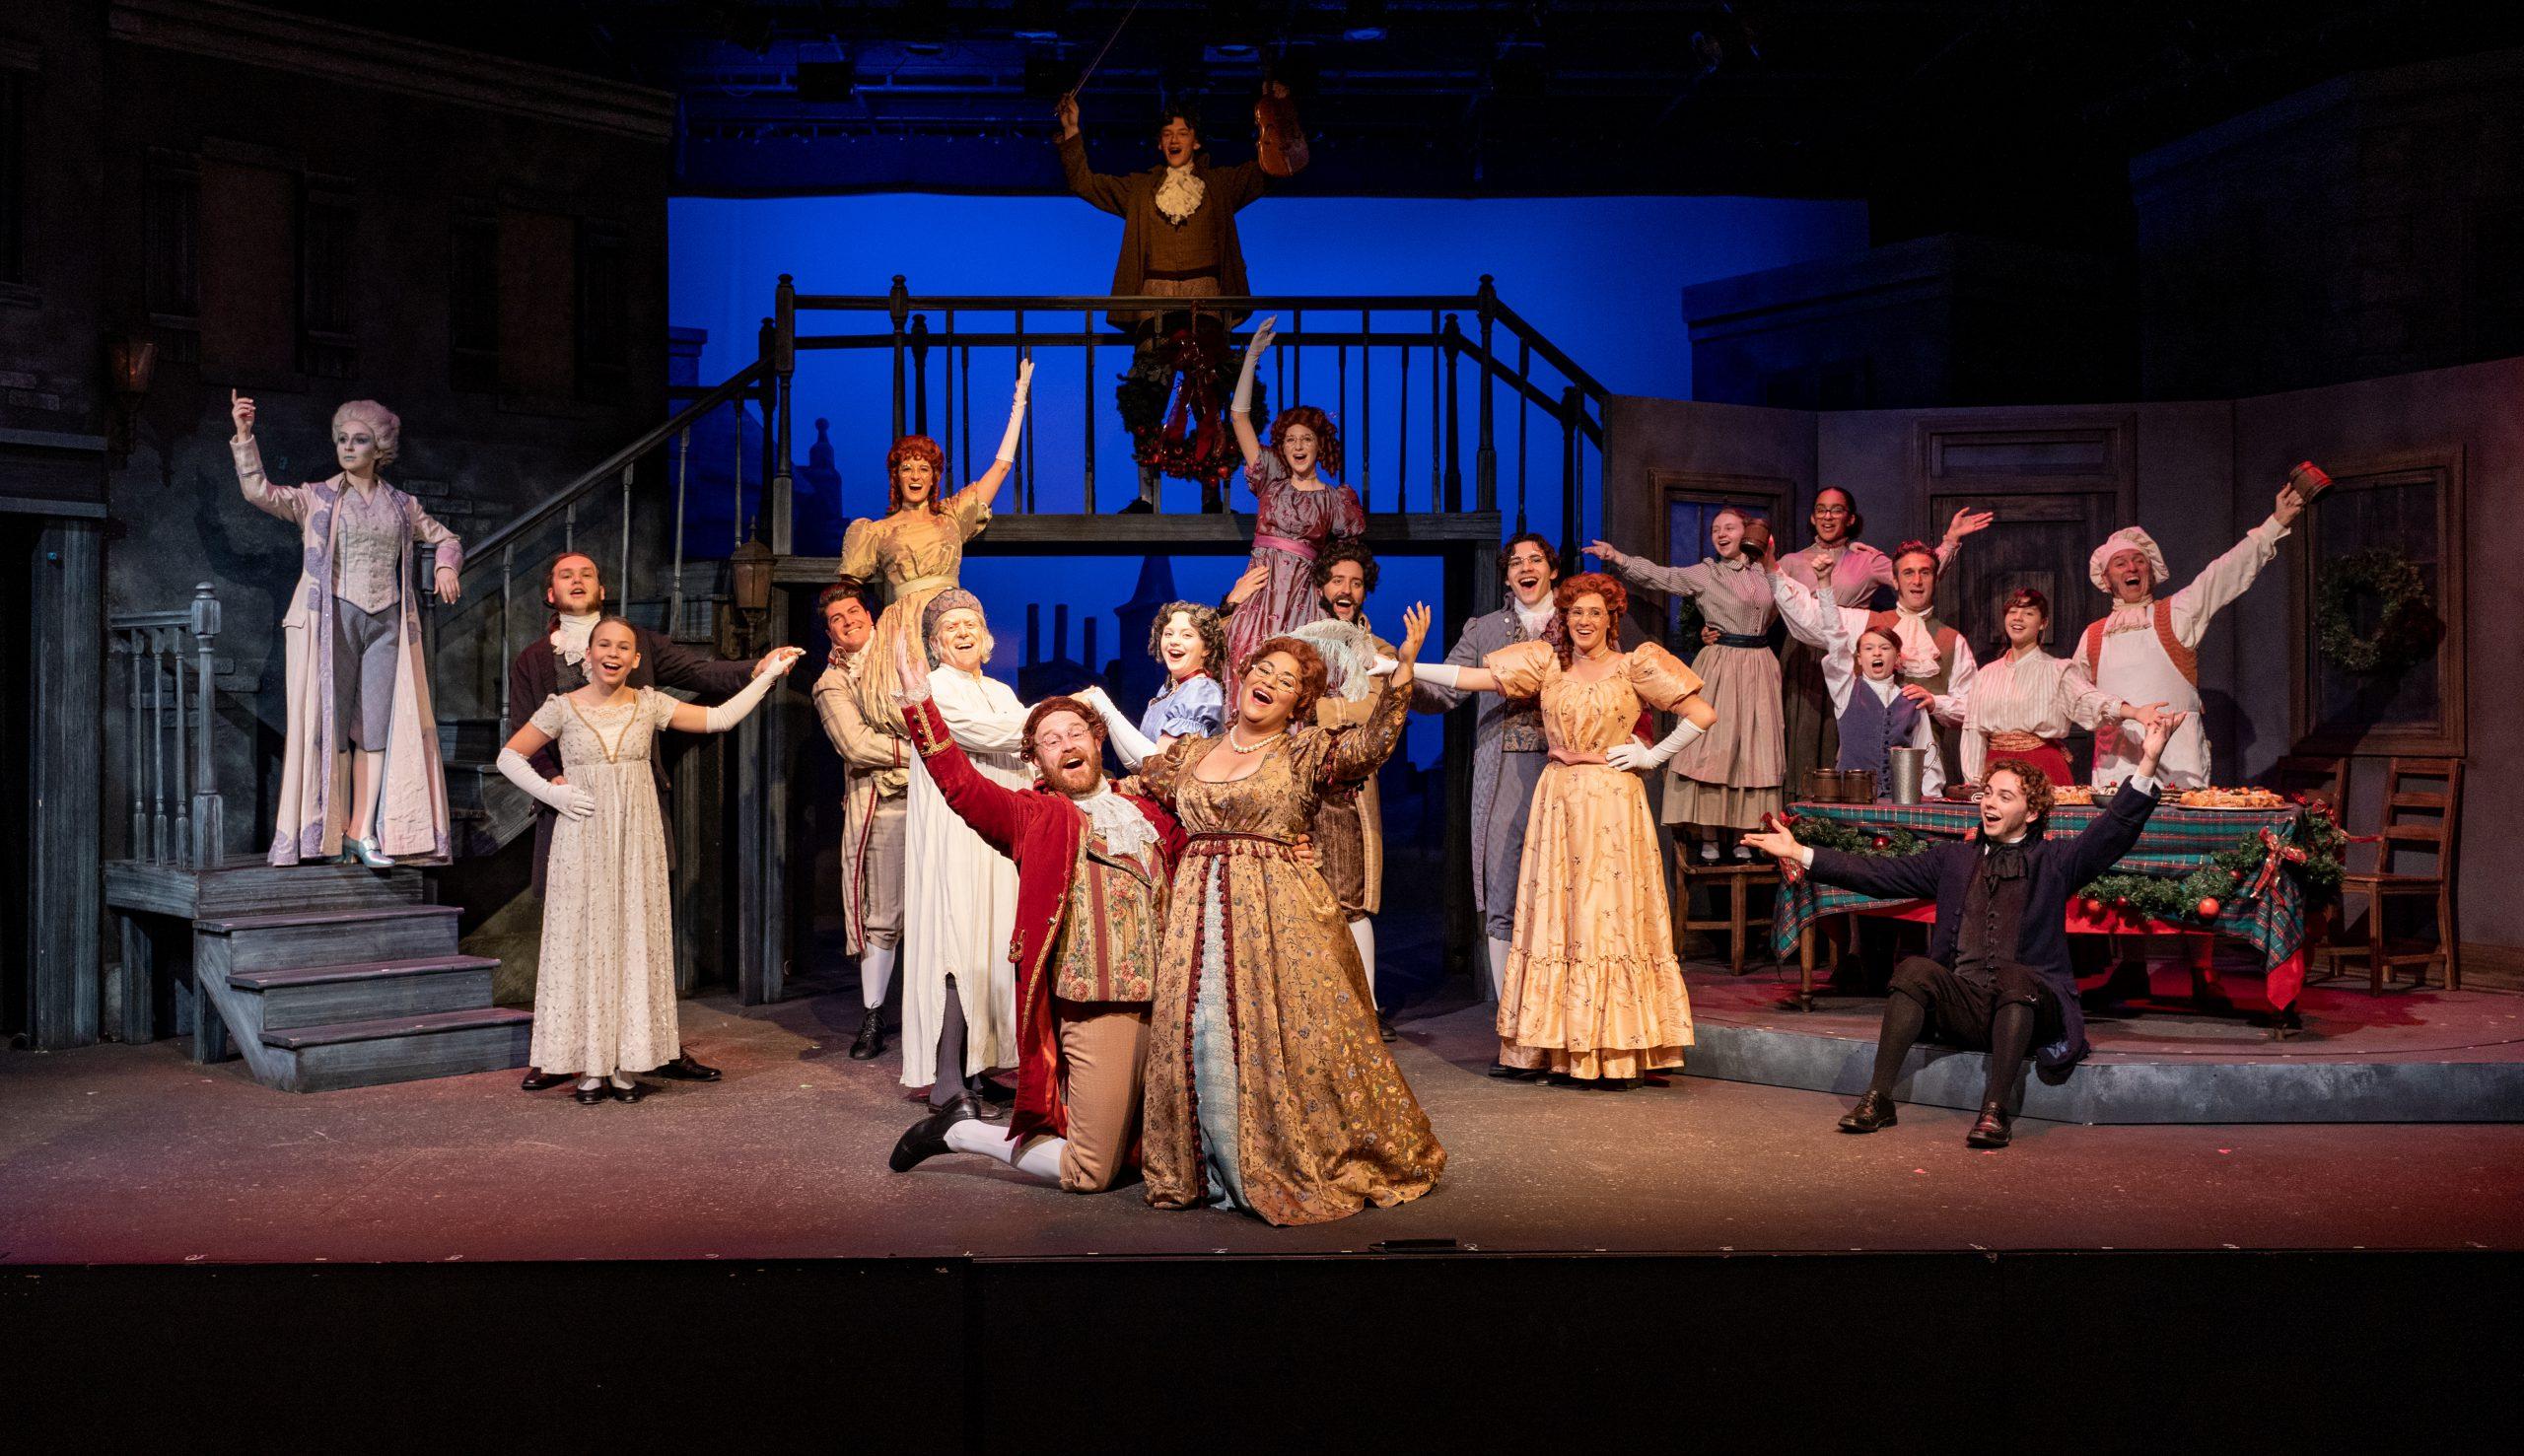 Christmas Plays In Sacramento 2020 A Christmas Carol   STC   Sacramento Theatre Company